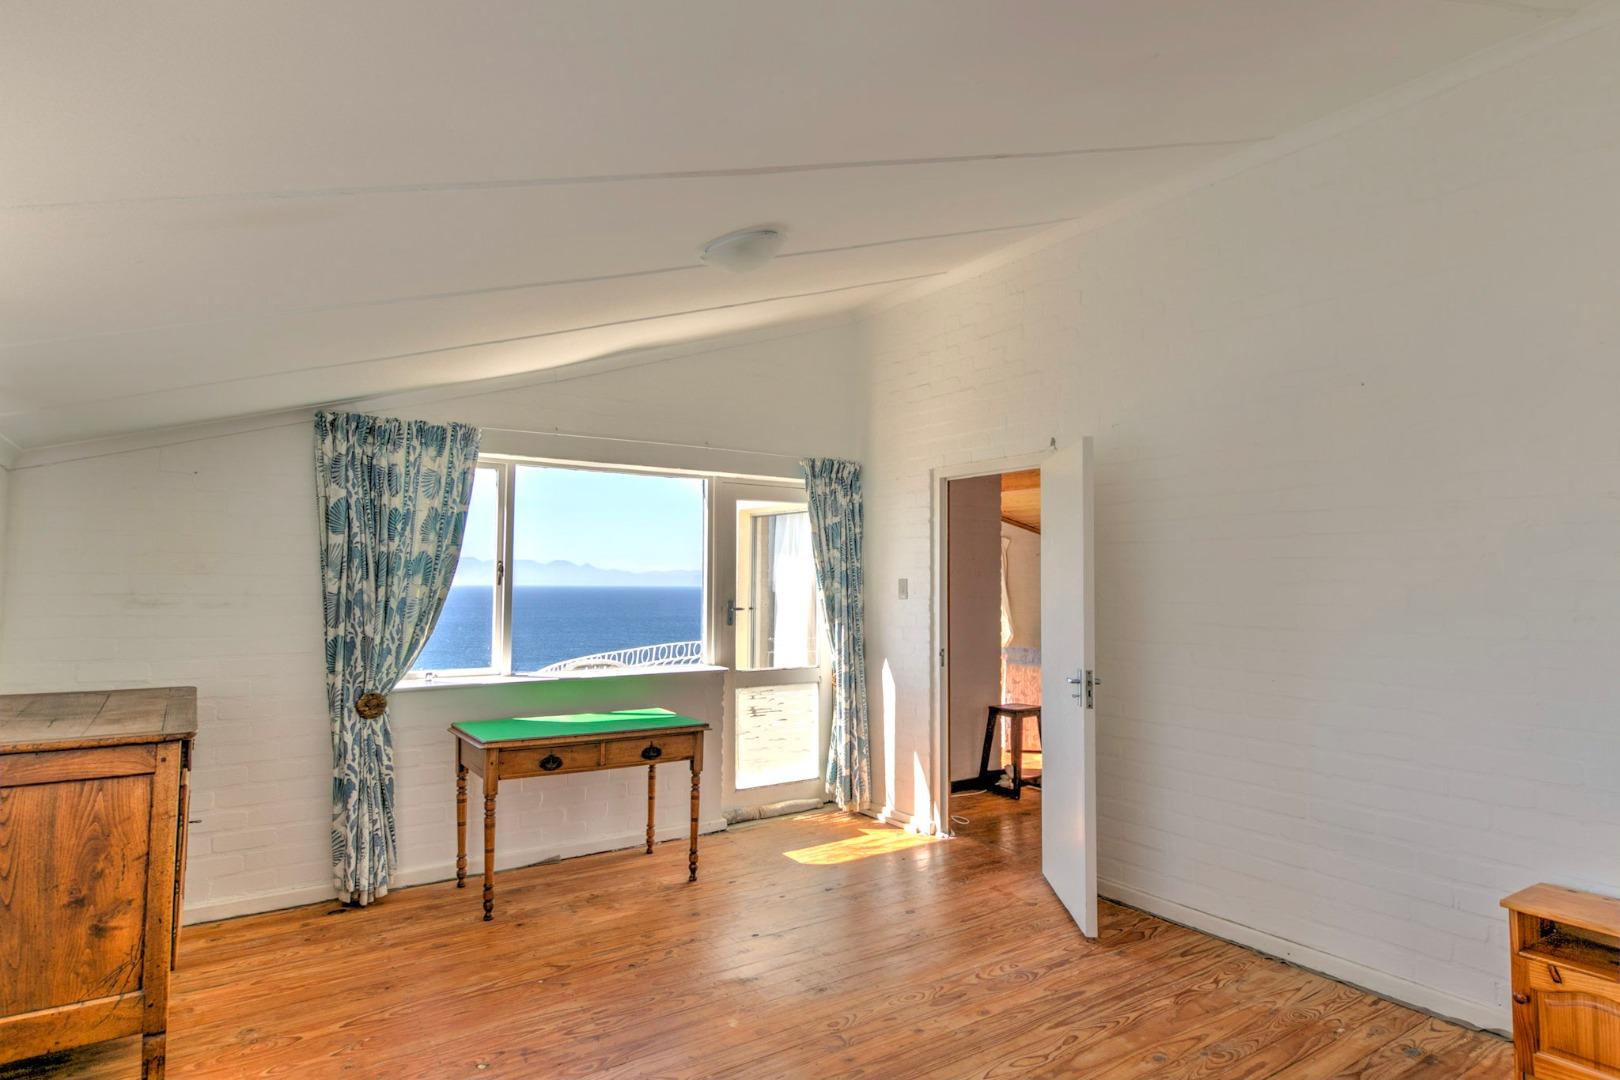 3 Bedroom House For Sale in Murdock Valley